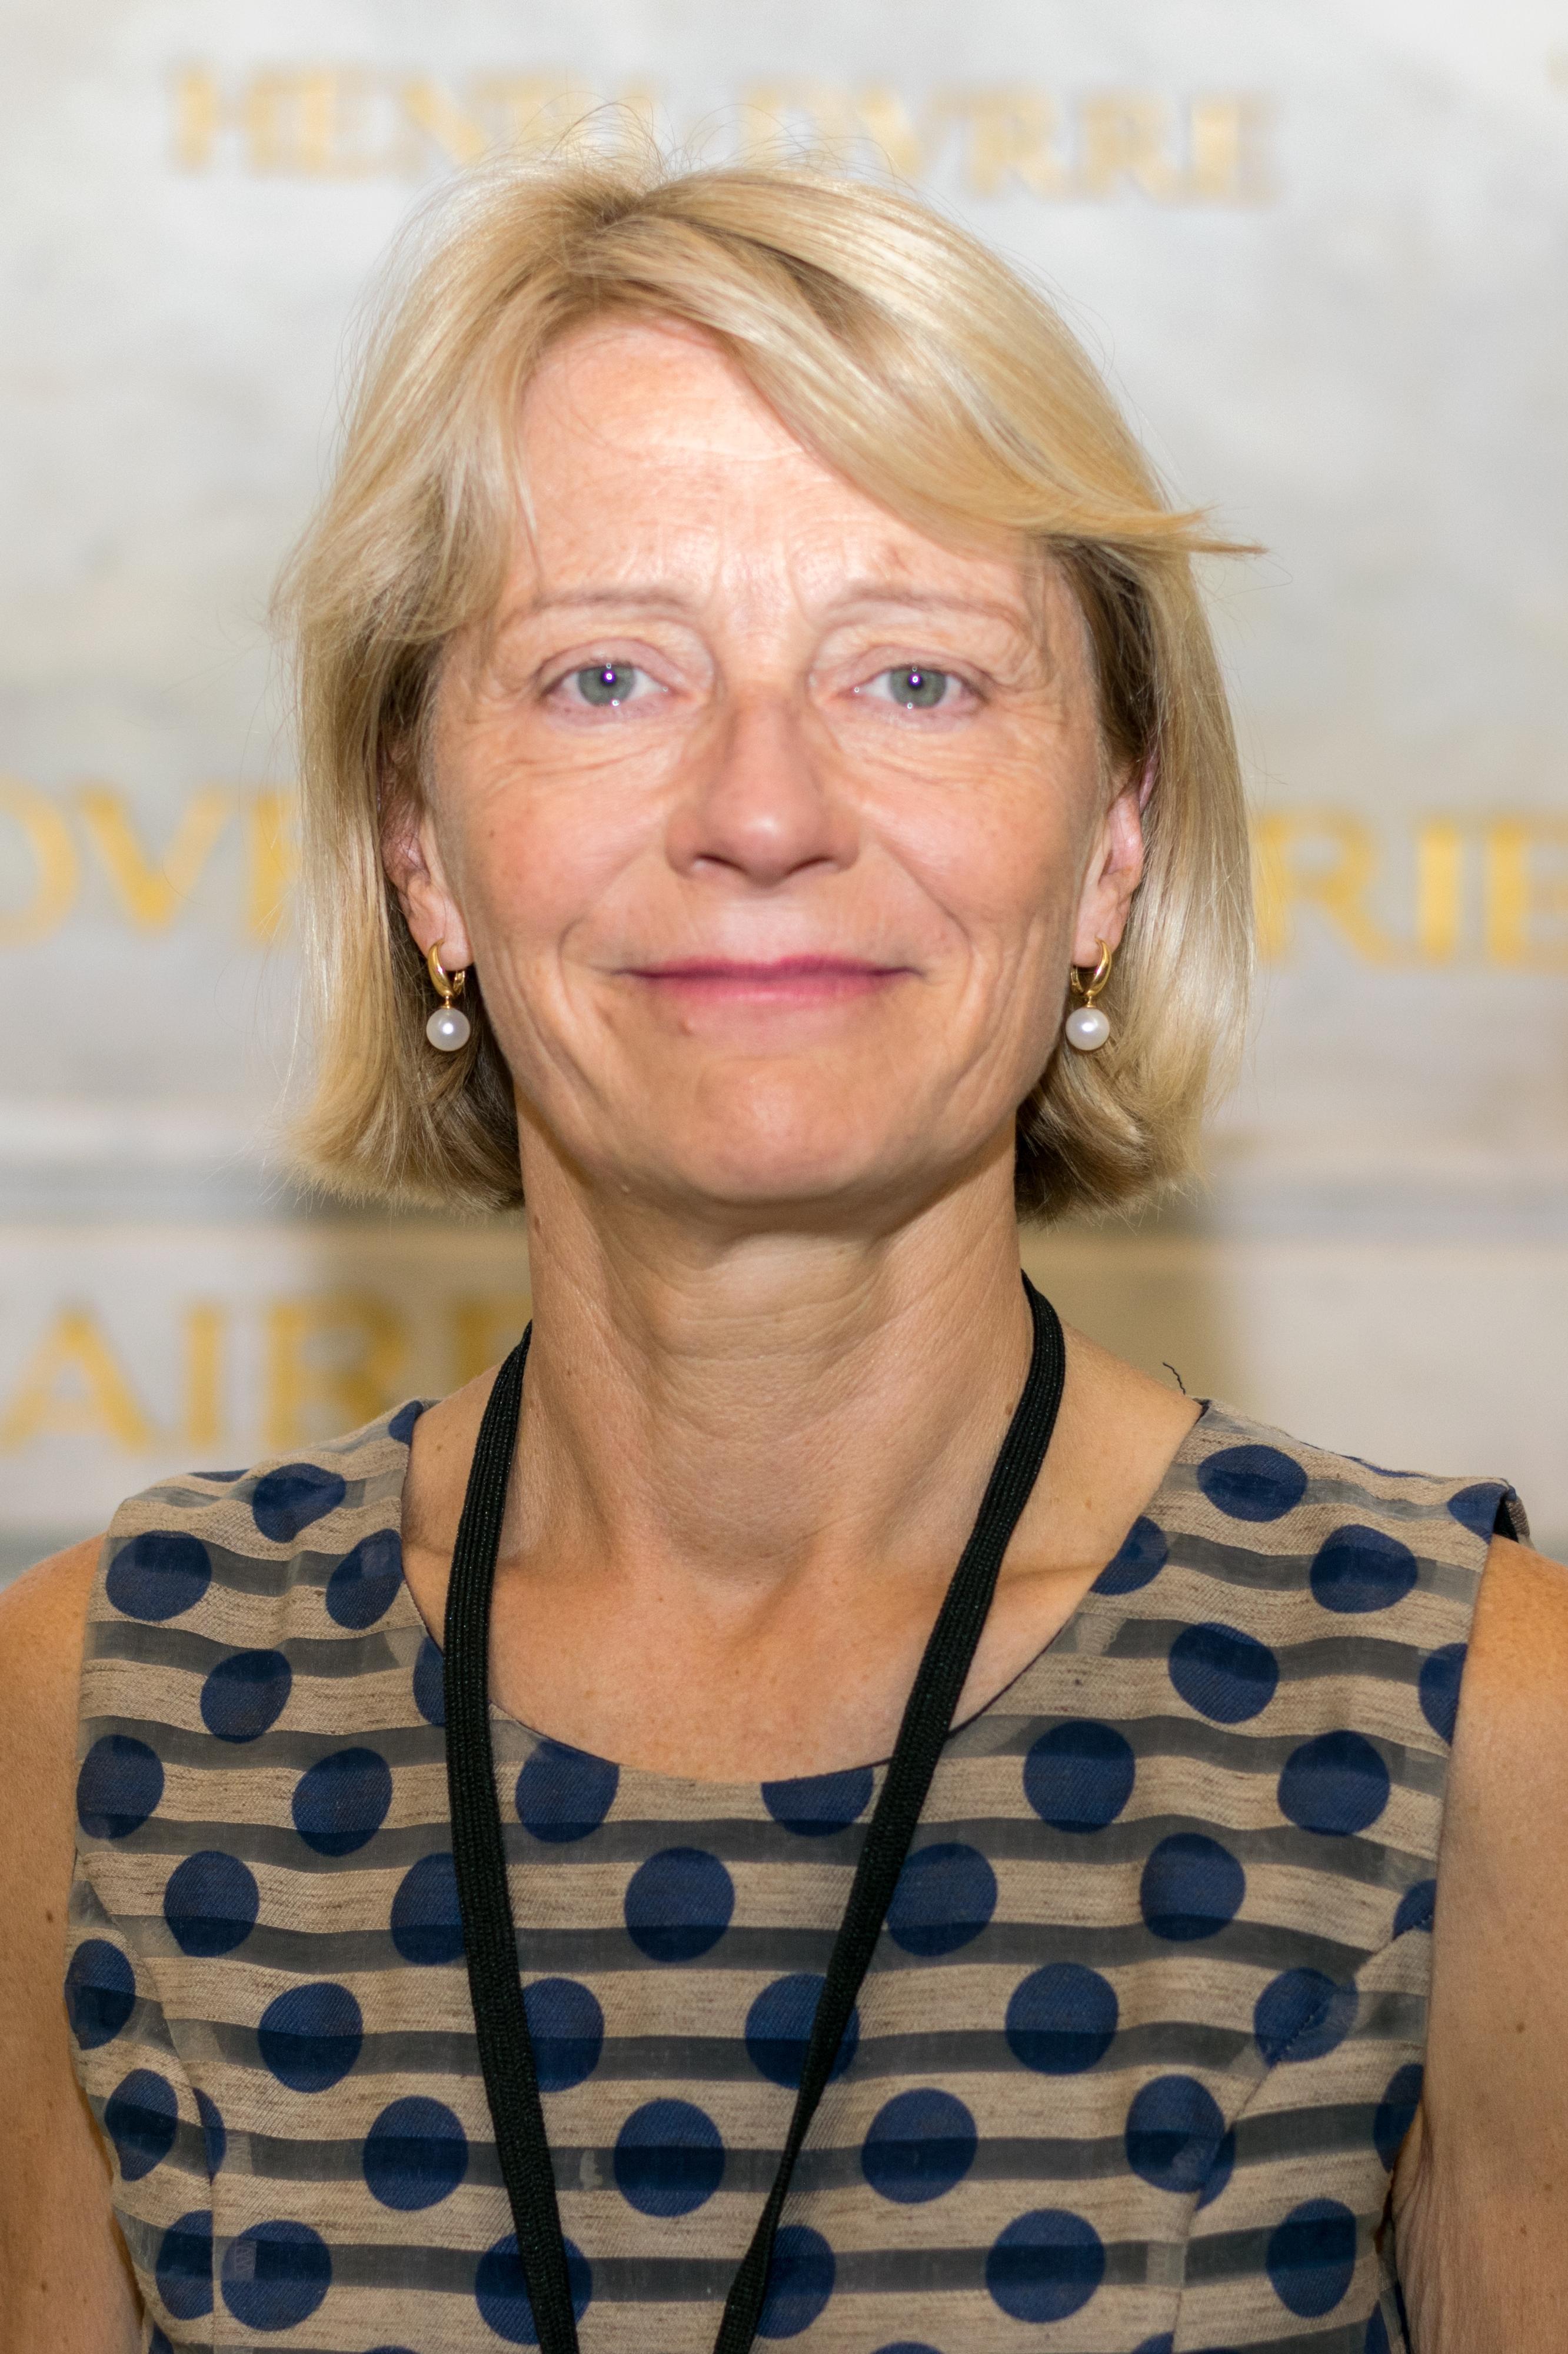 Datei:Véronique Louwagie (cropped).jpg – Wikipedia